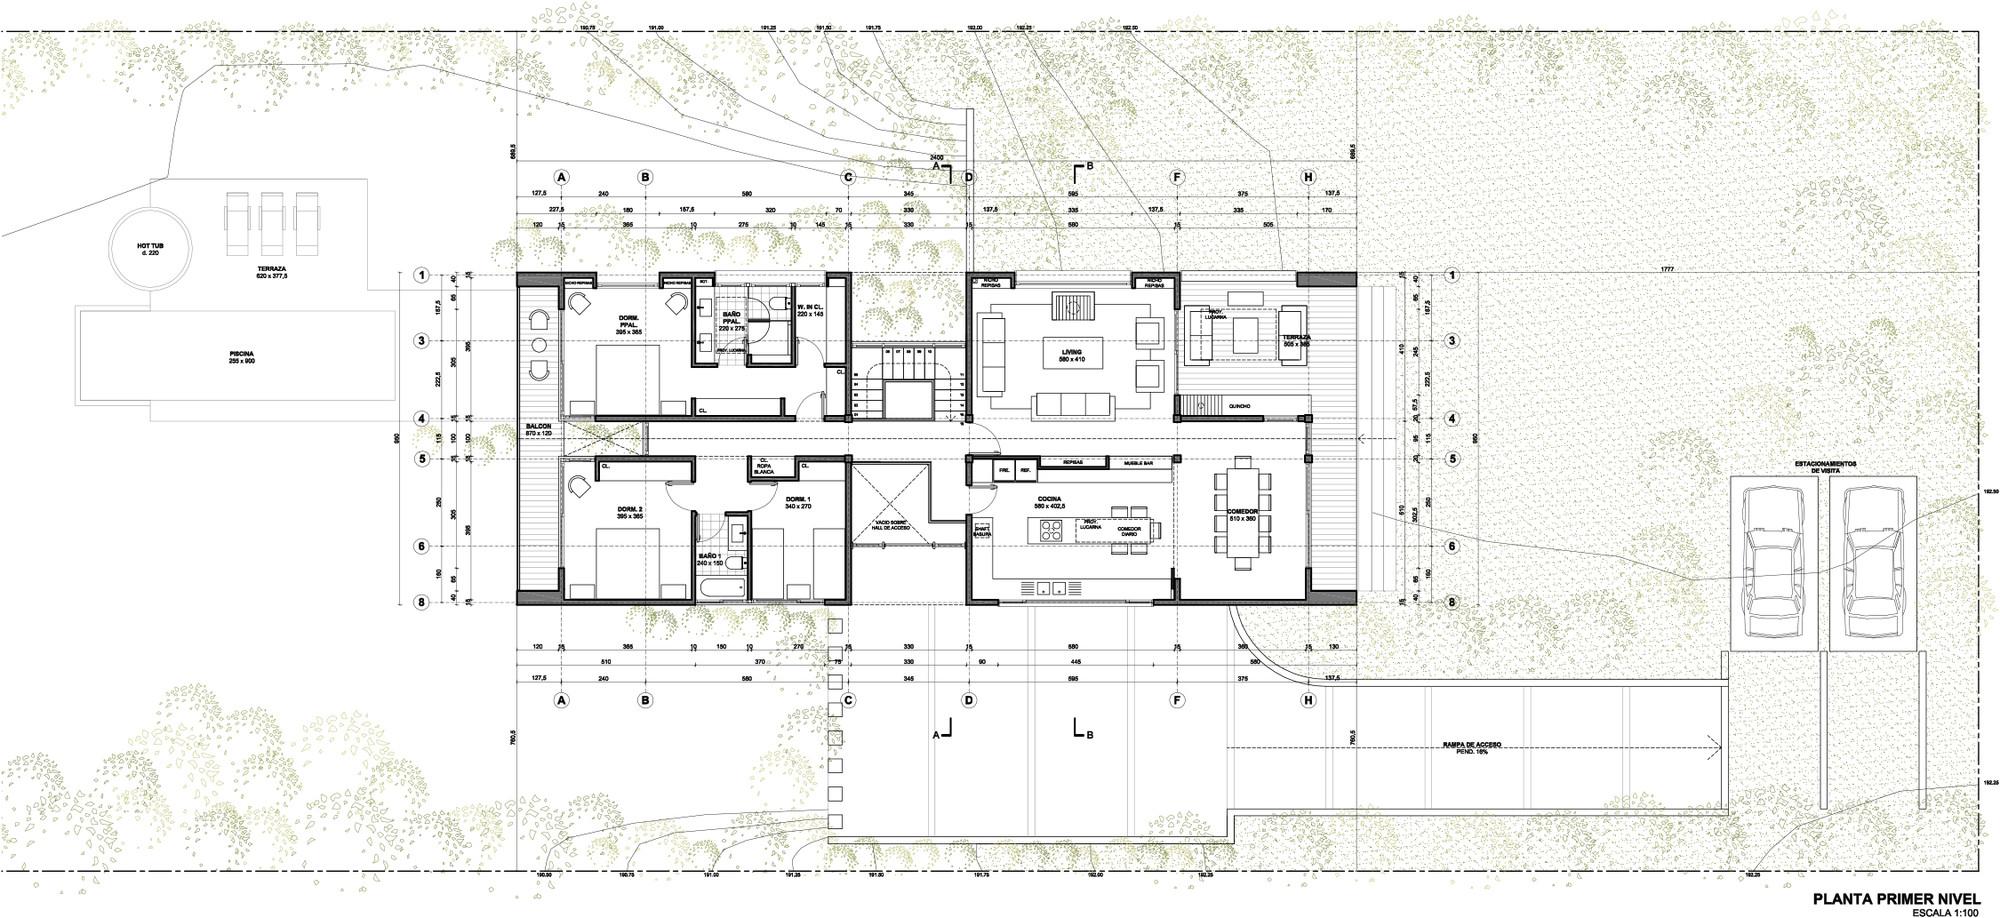 Propuesta de Marianne Balze: planta primer piso. Image Courtesy of Patagonia Virgin